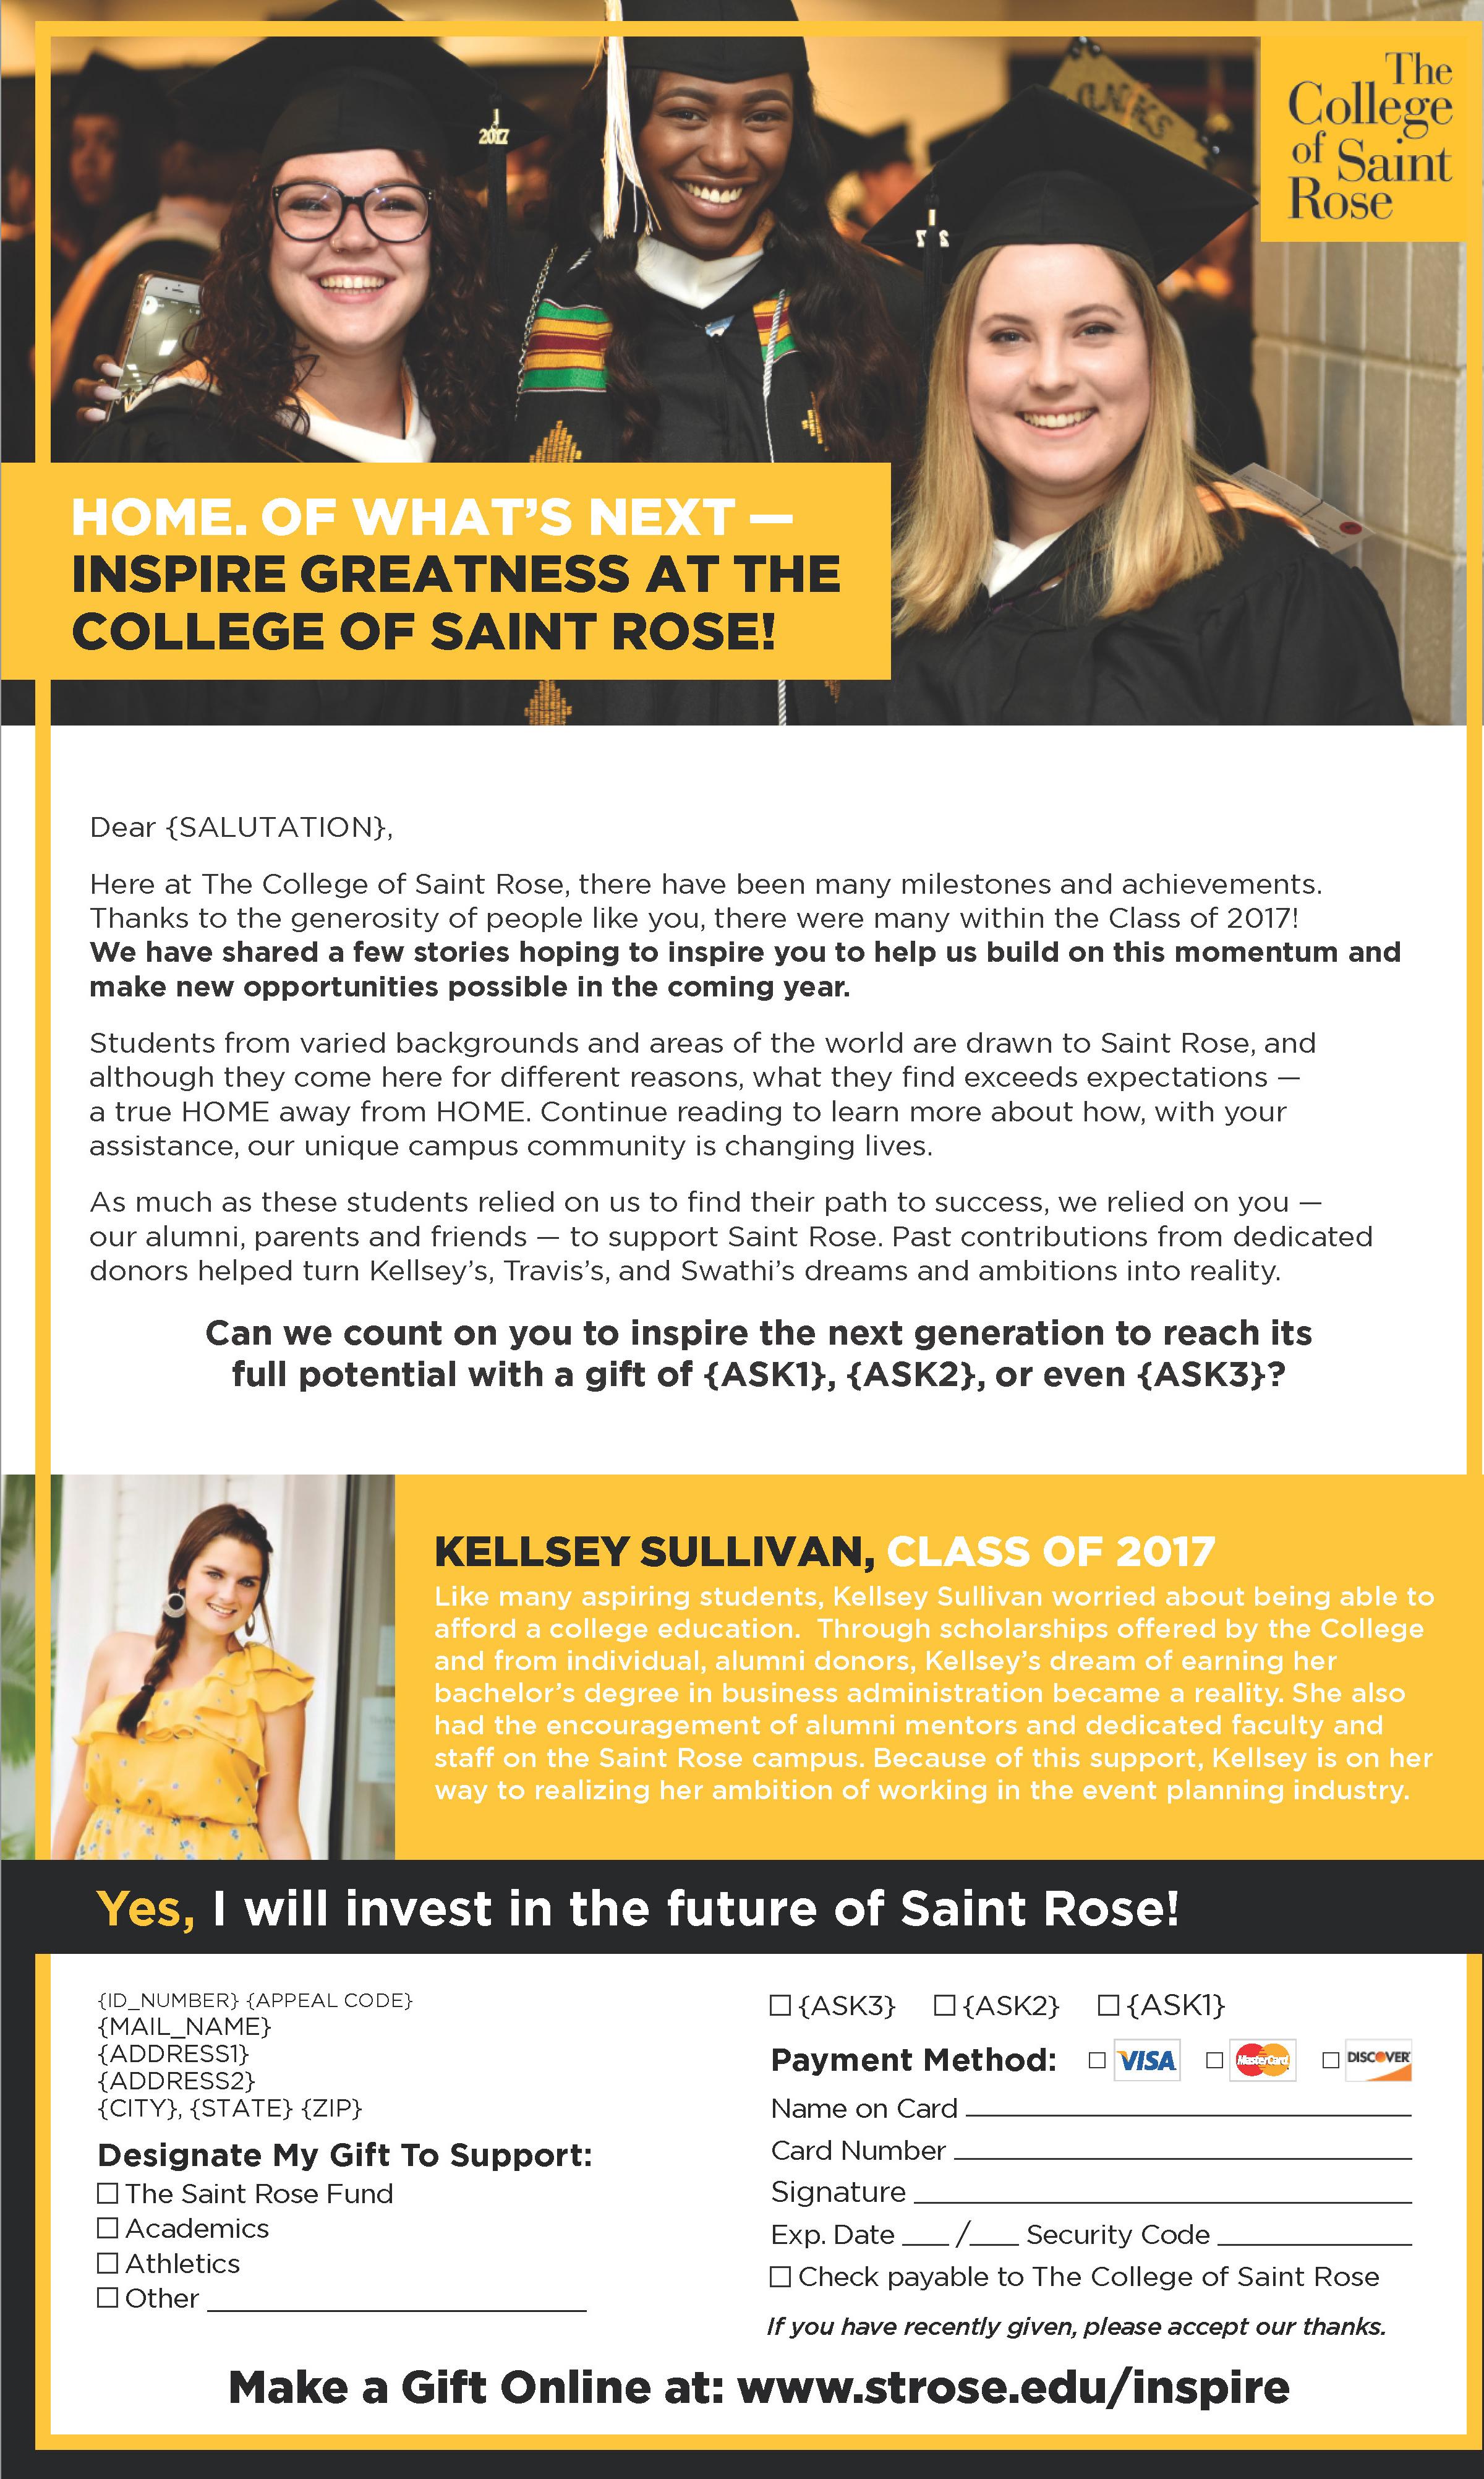 Higher education marketing awards winnerL College of Saint Rose